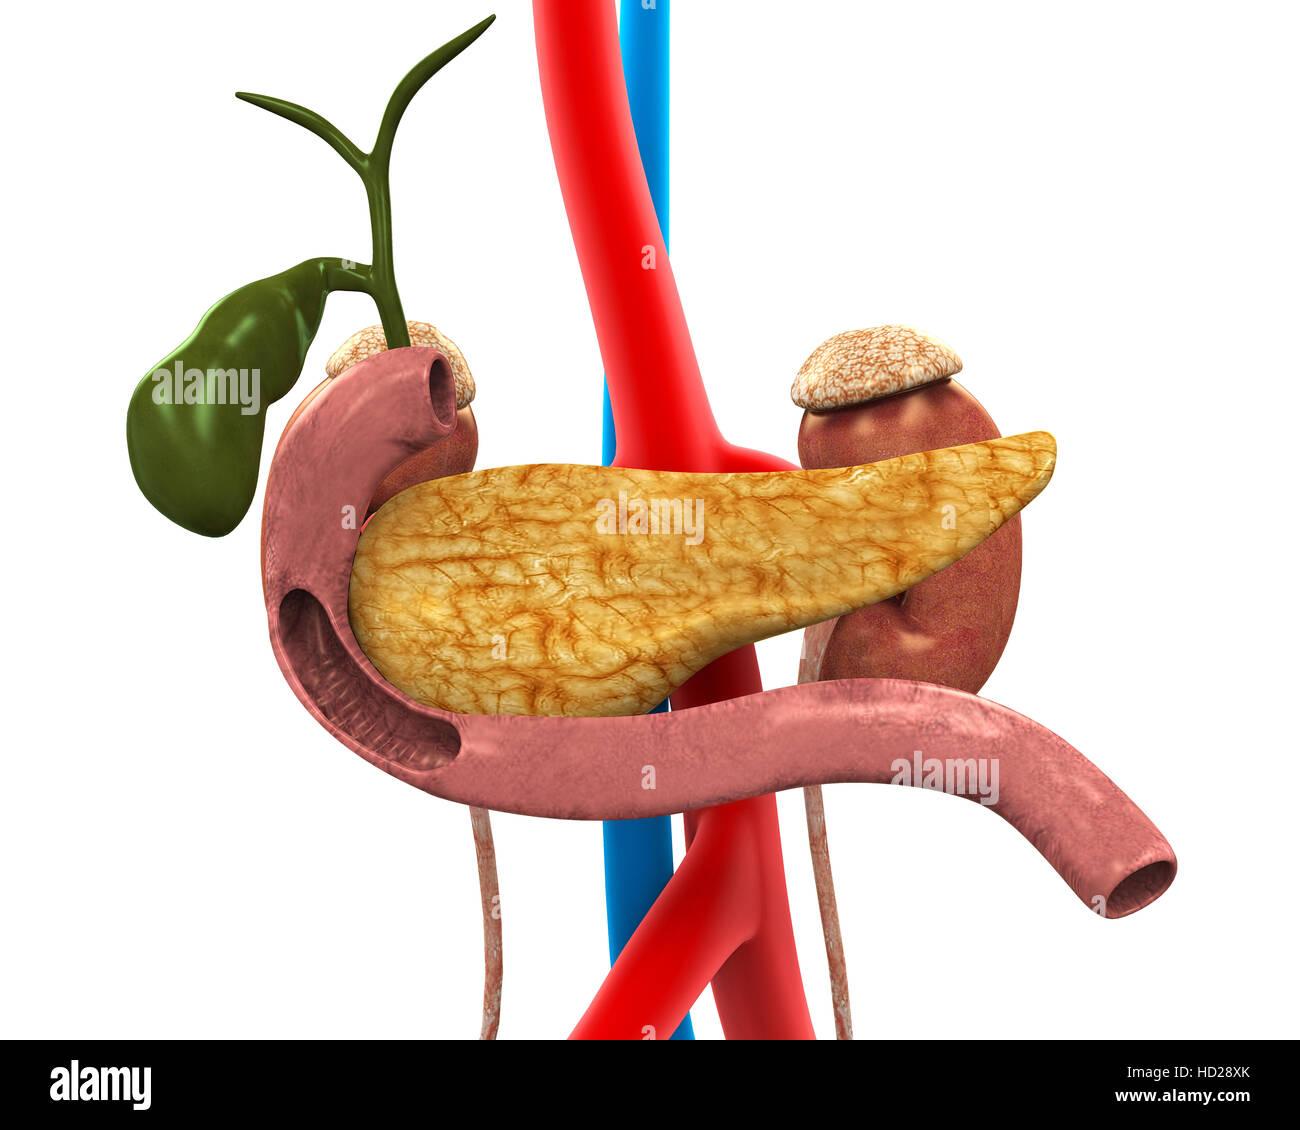 Human Gallbladder And Pancreas Anatomy Stock Photo 128514027 Alamy